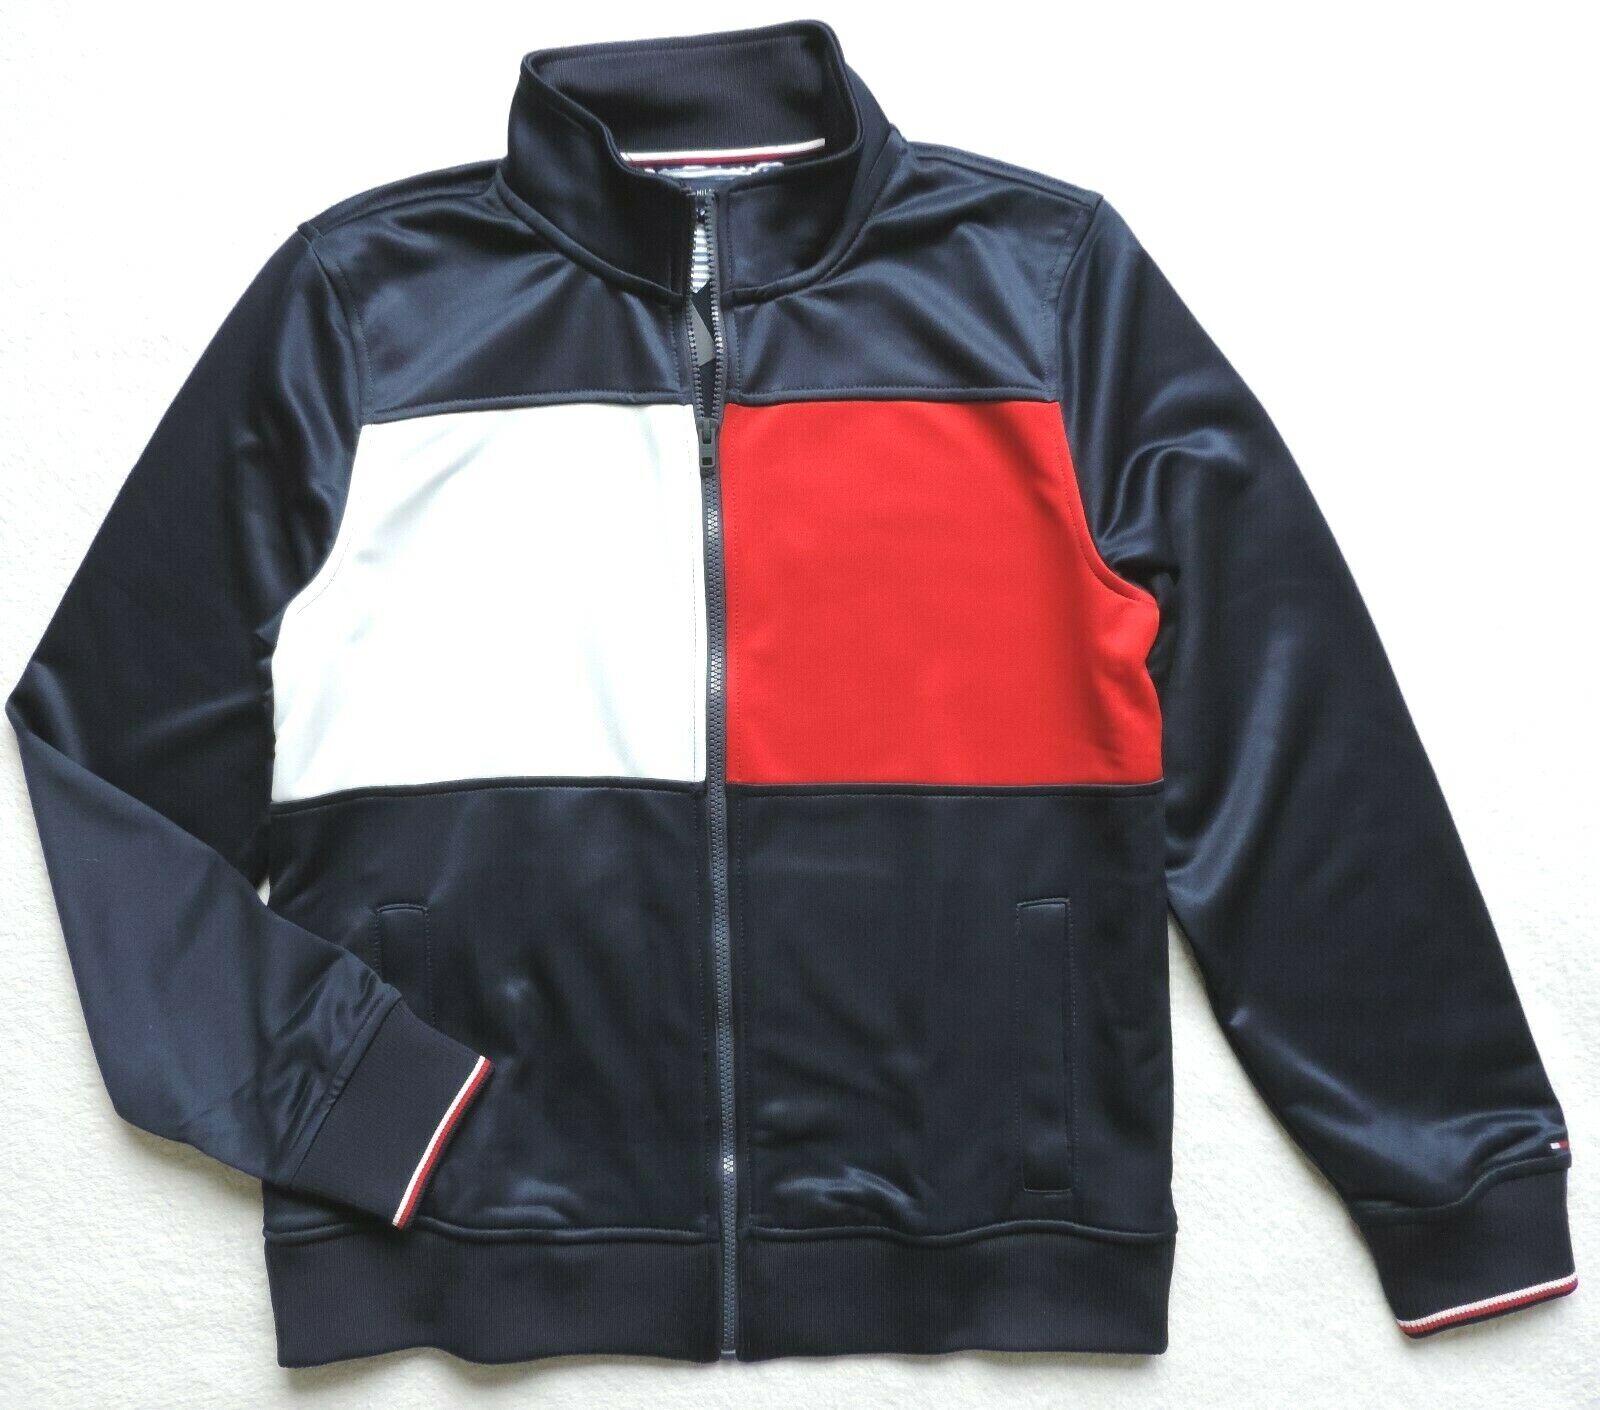 Tommy Hilfiger Herren Logo Reißverschluss Trainingsjacke, Marineblau/Rot/